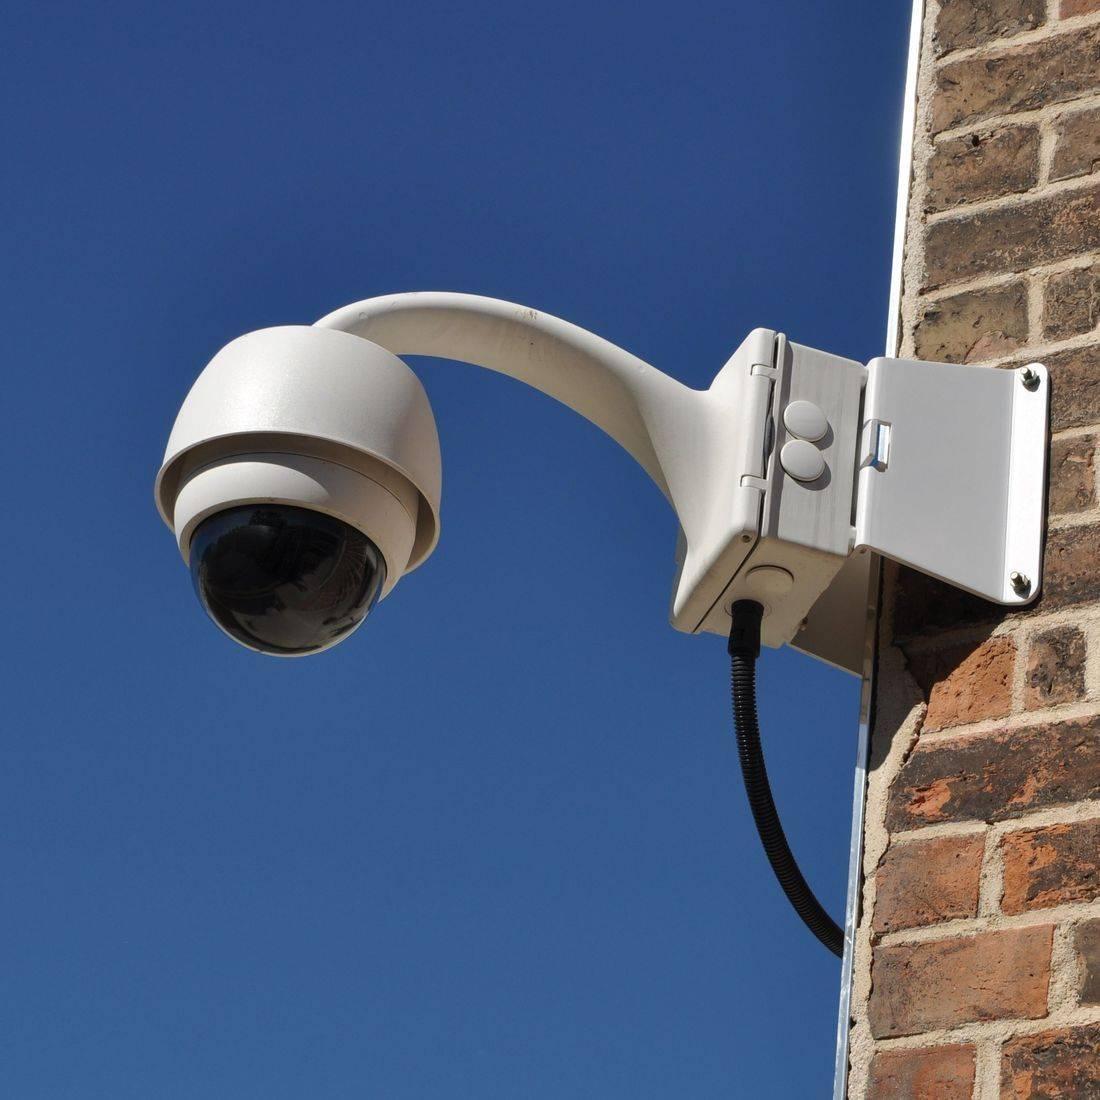 Corner mount PTZ (Pan, Tilt & Zoom) cameras allow for 270 degree surveillance